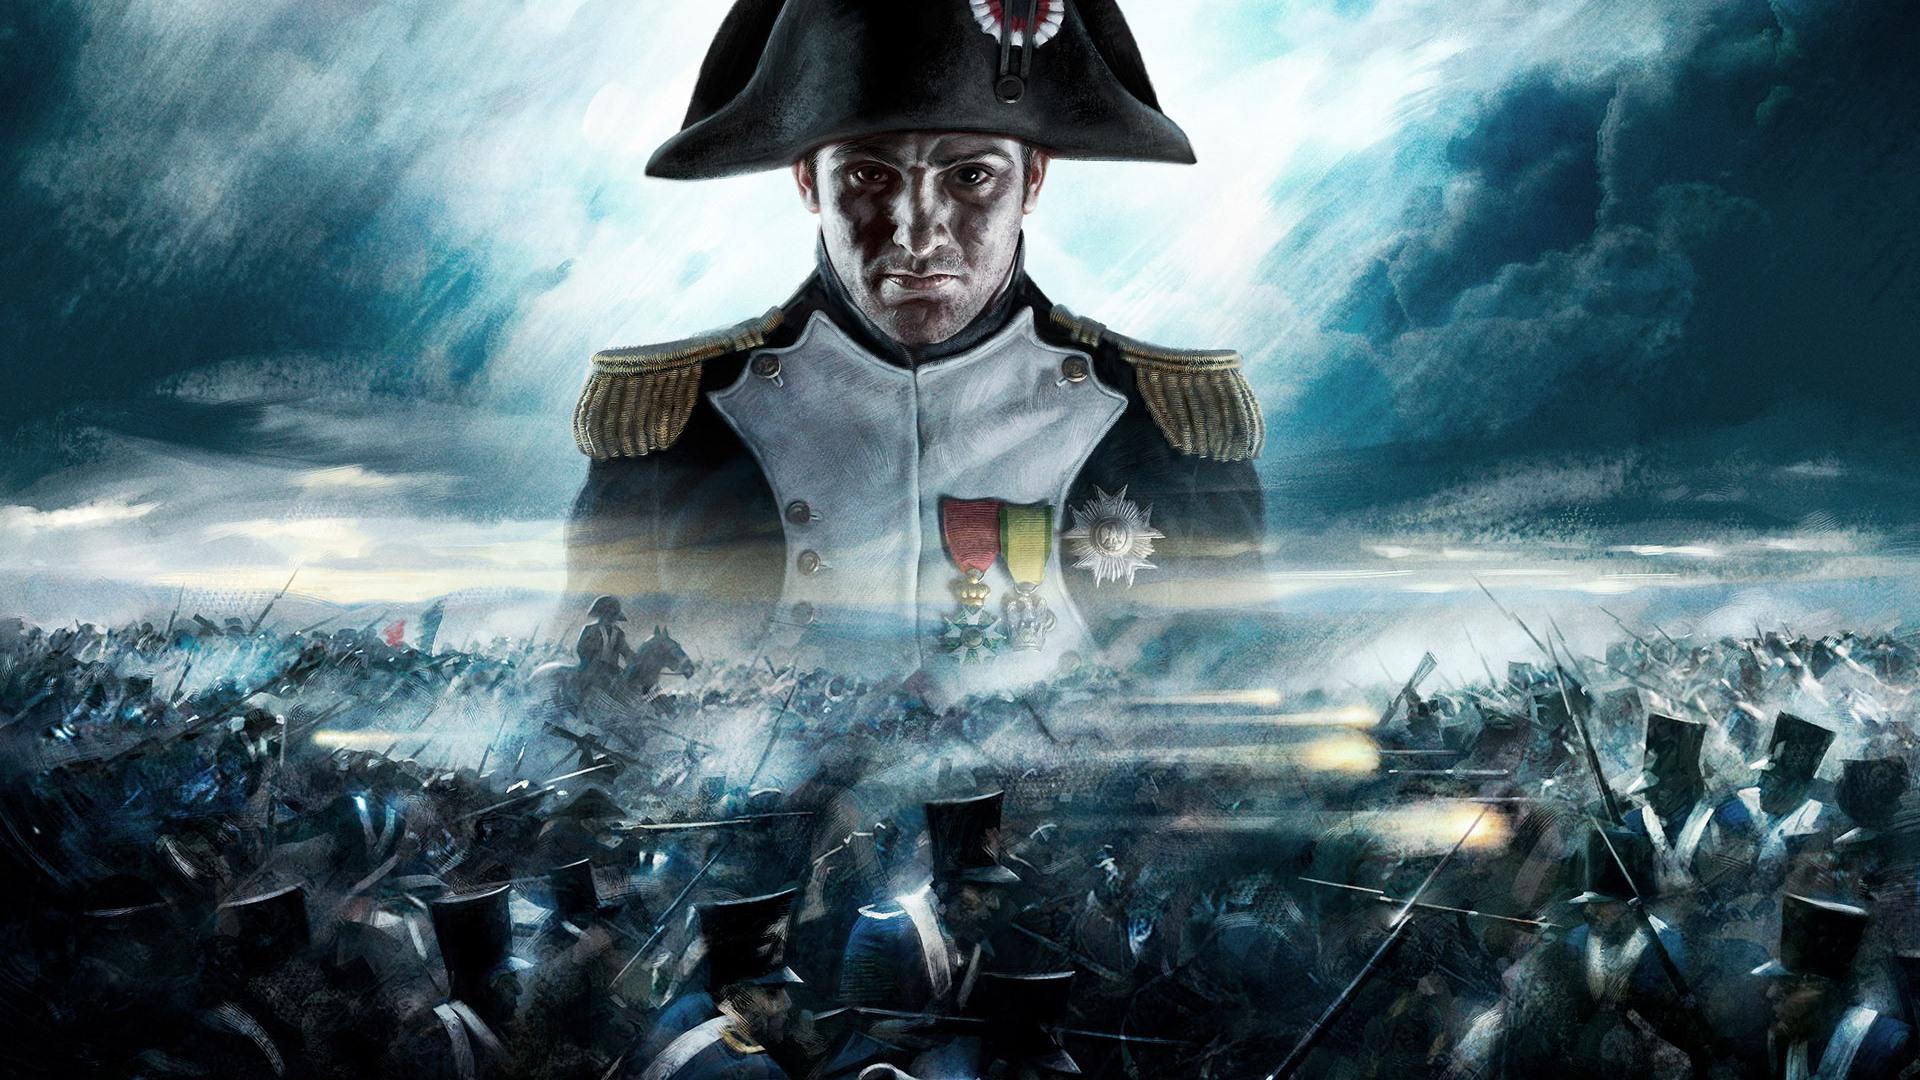 Empire Total War Wallpapers